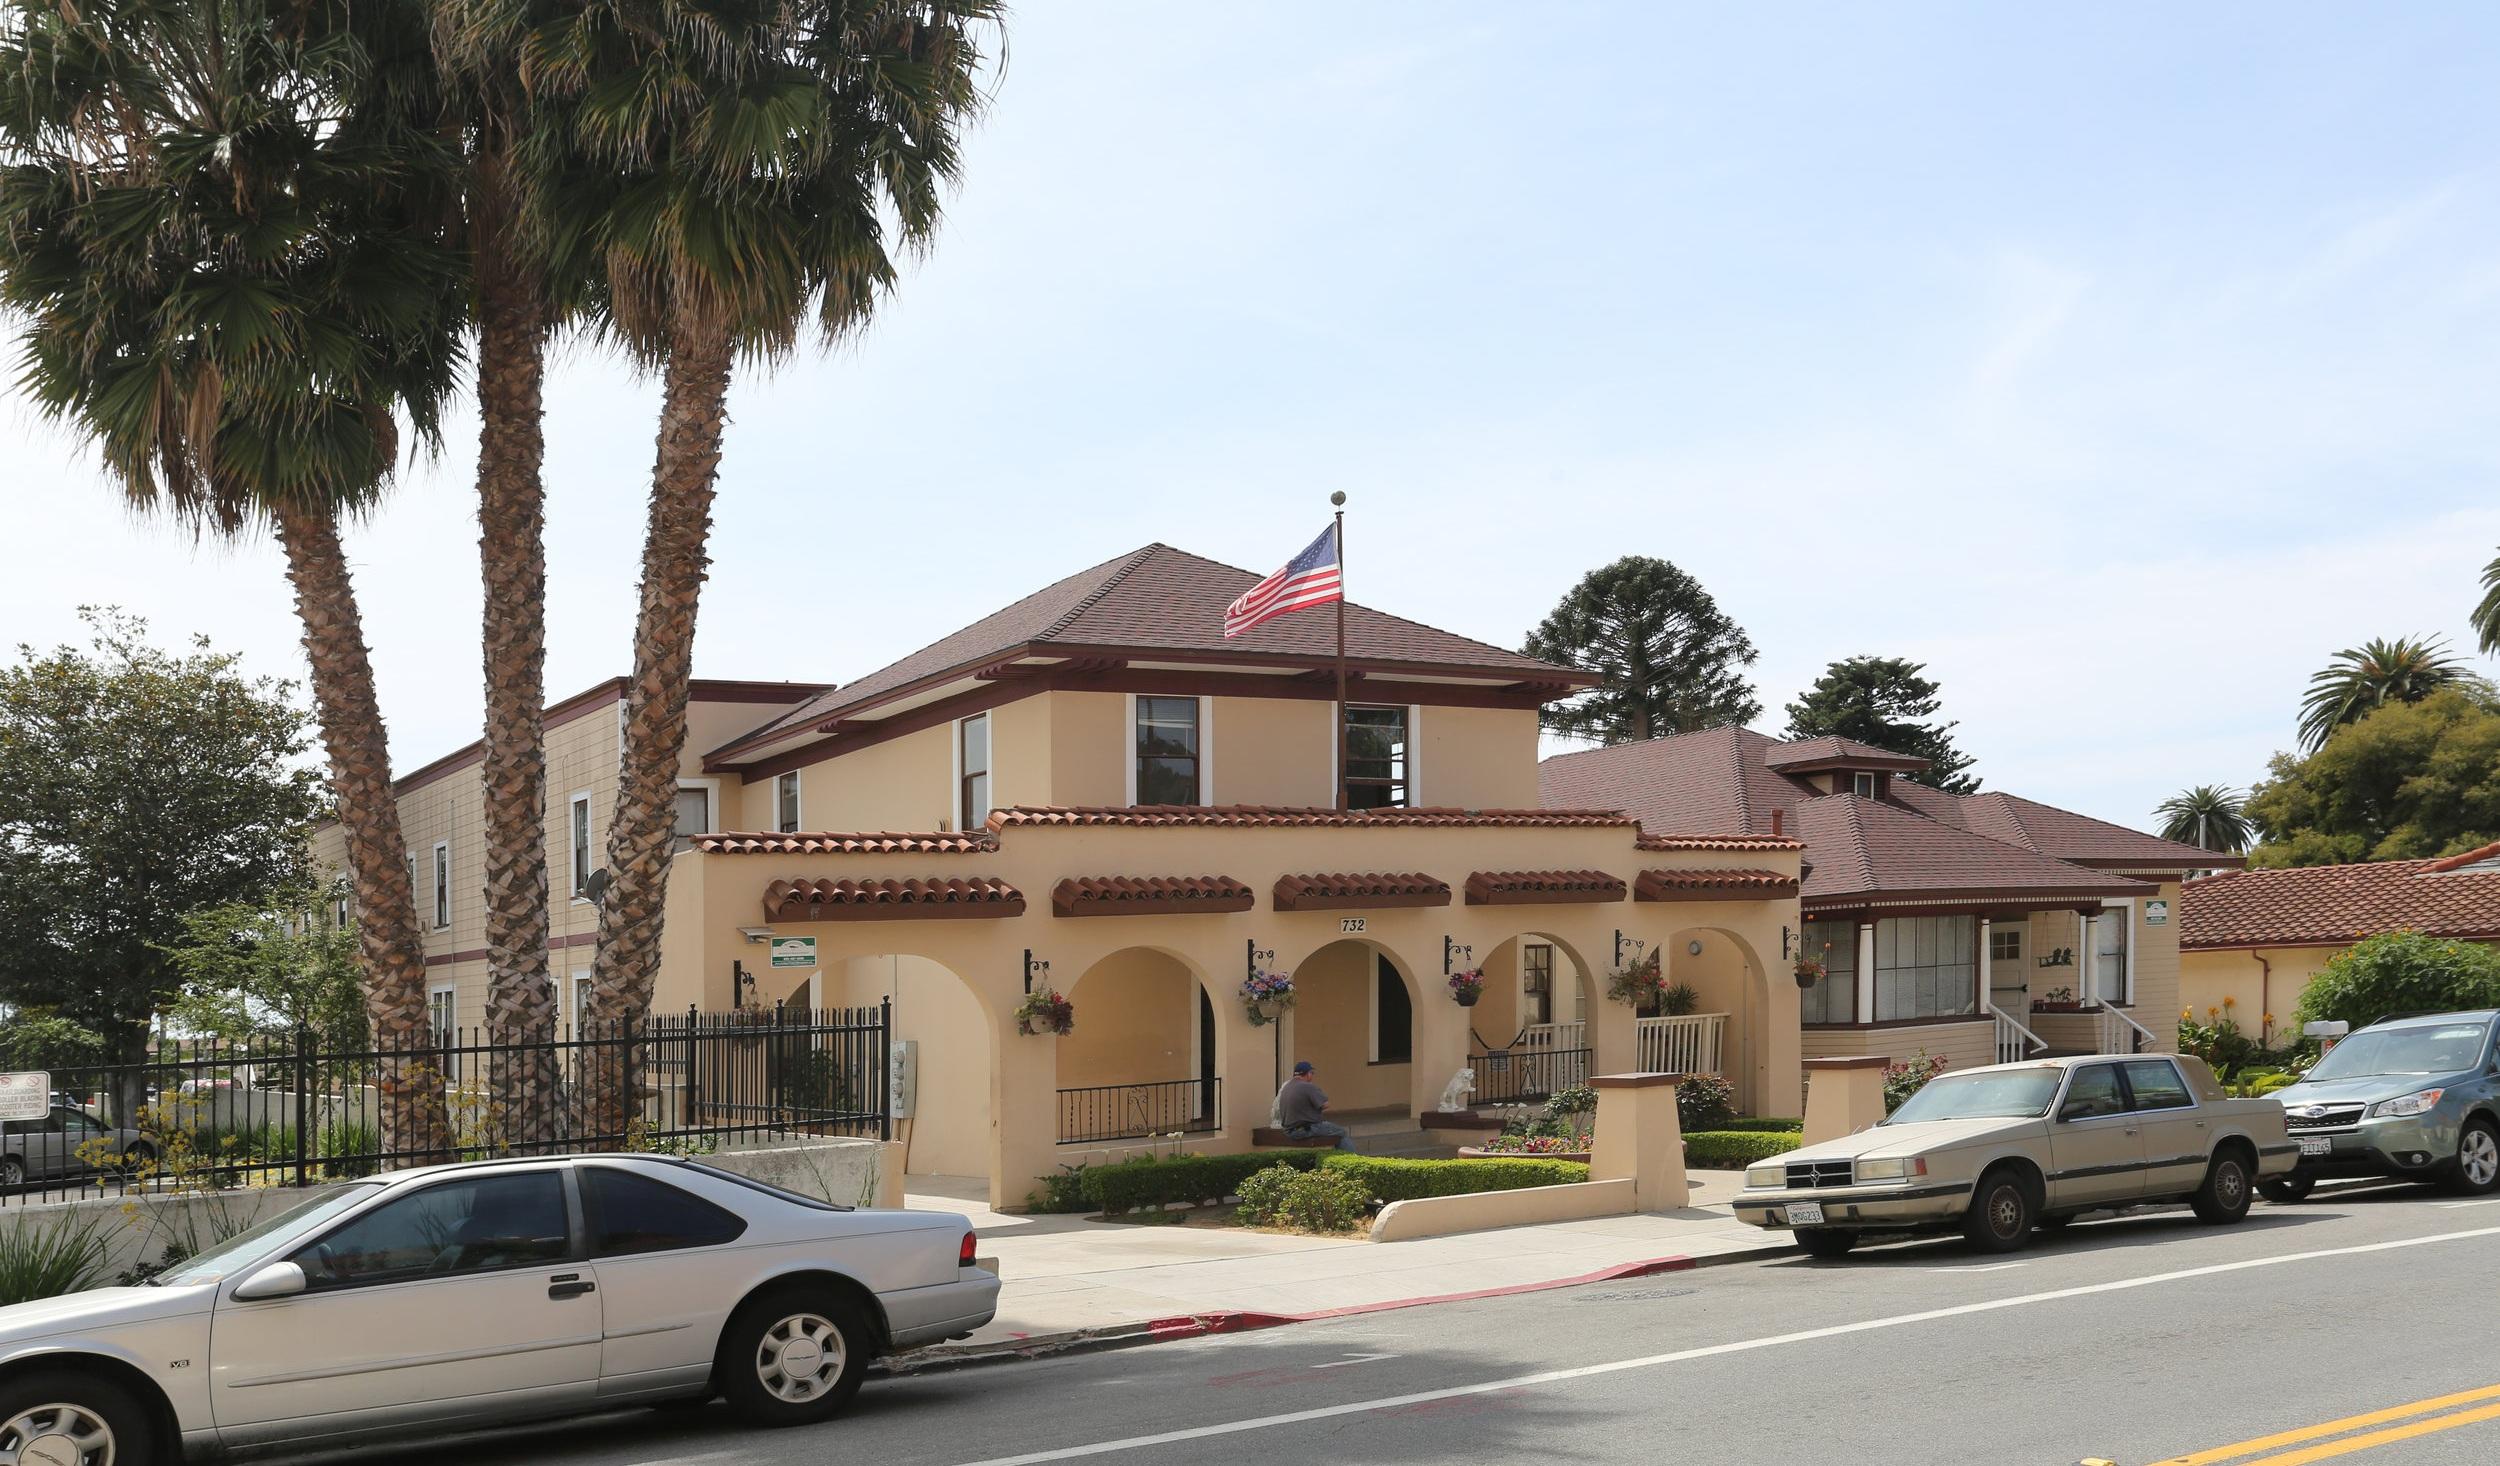 $3,800,000  Refinance  Ventura, CA